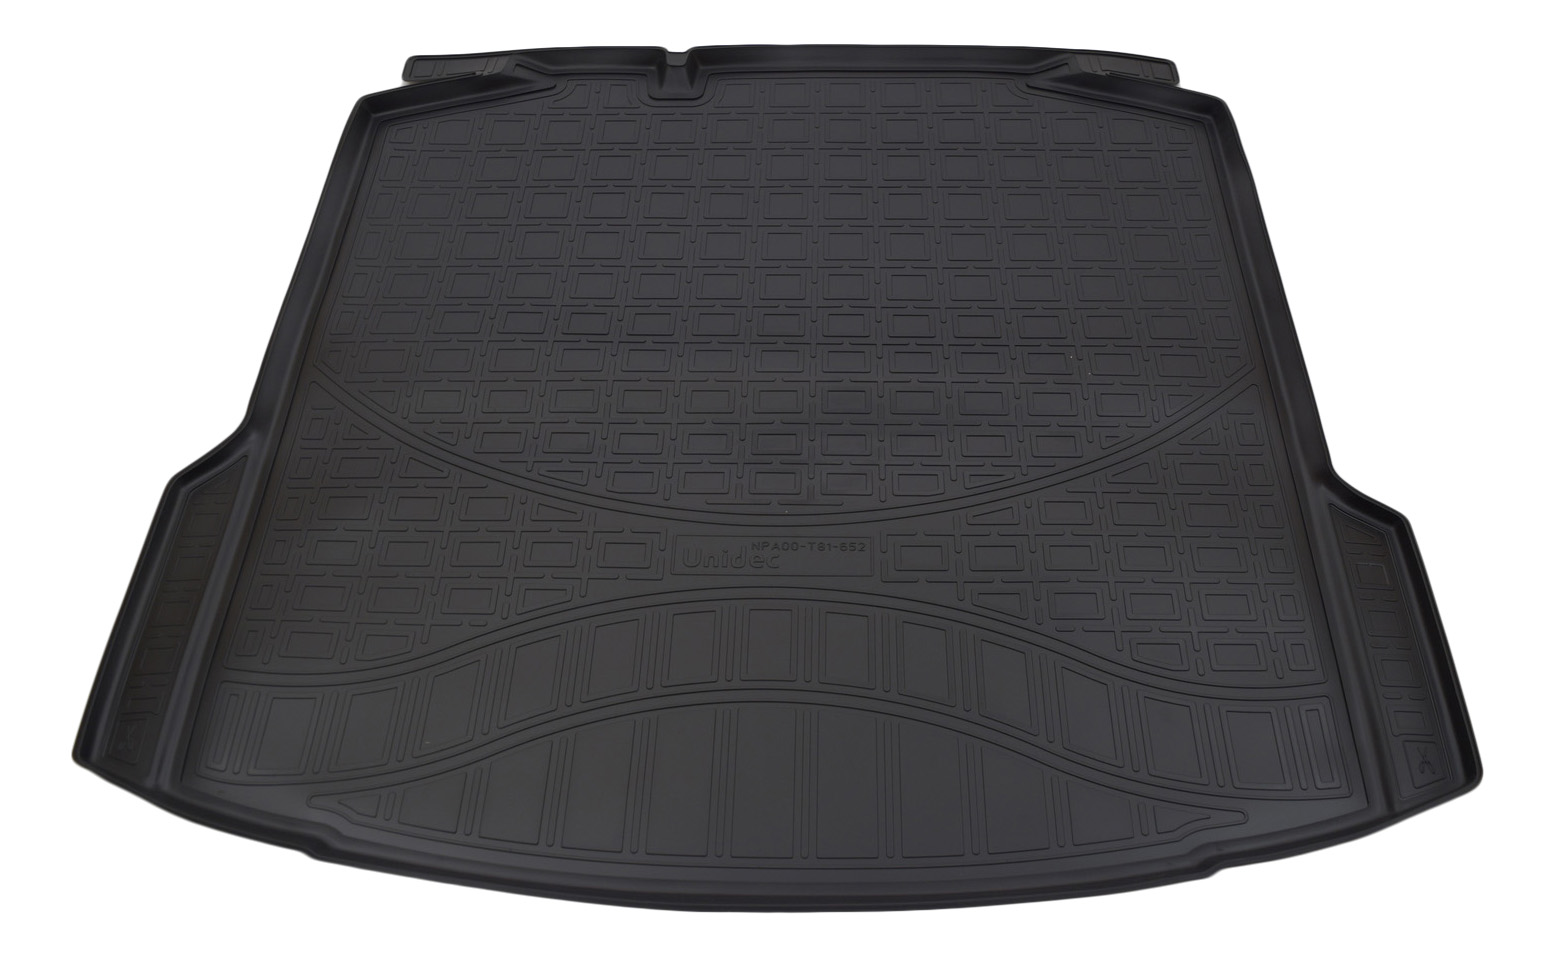 Коврик в багажник автомобиля для Skoda Norplast (NPA00-T81-652)